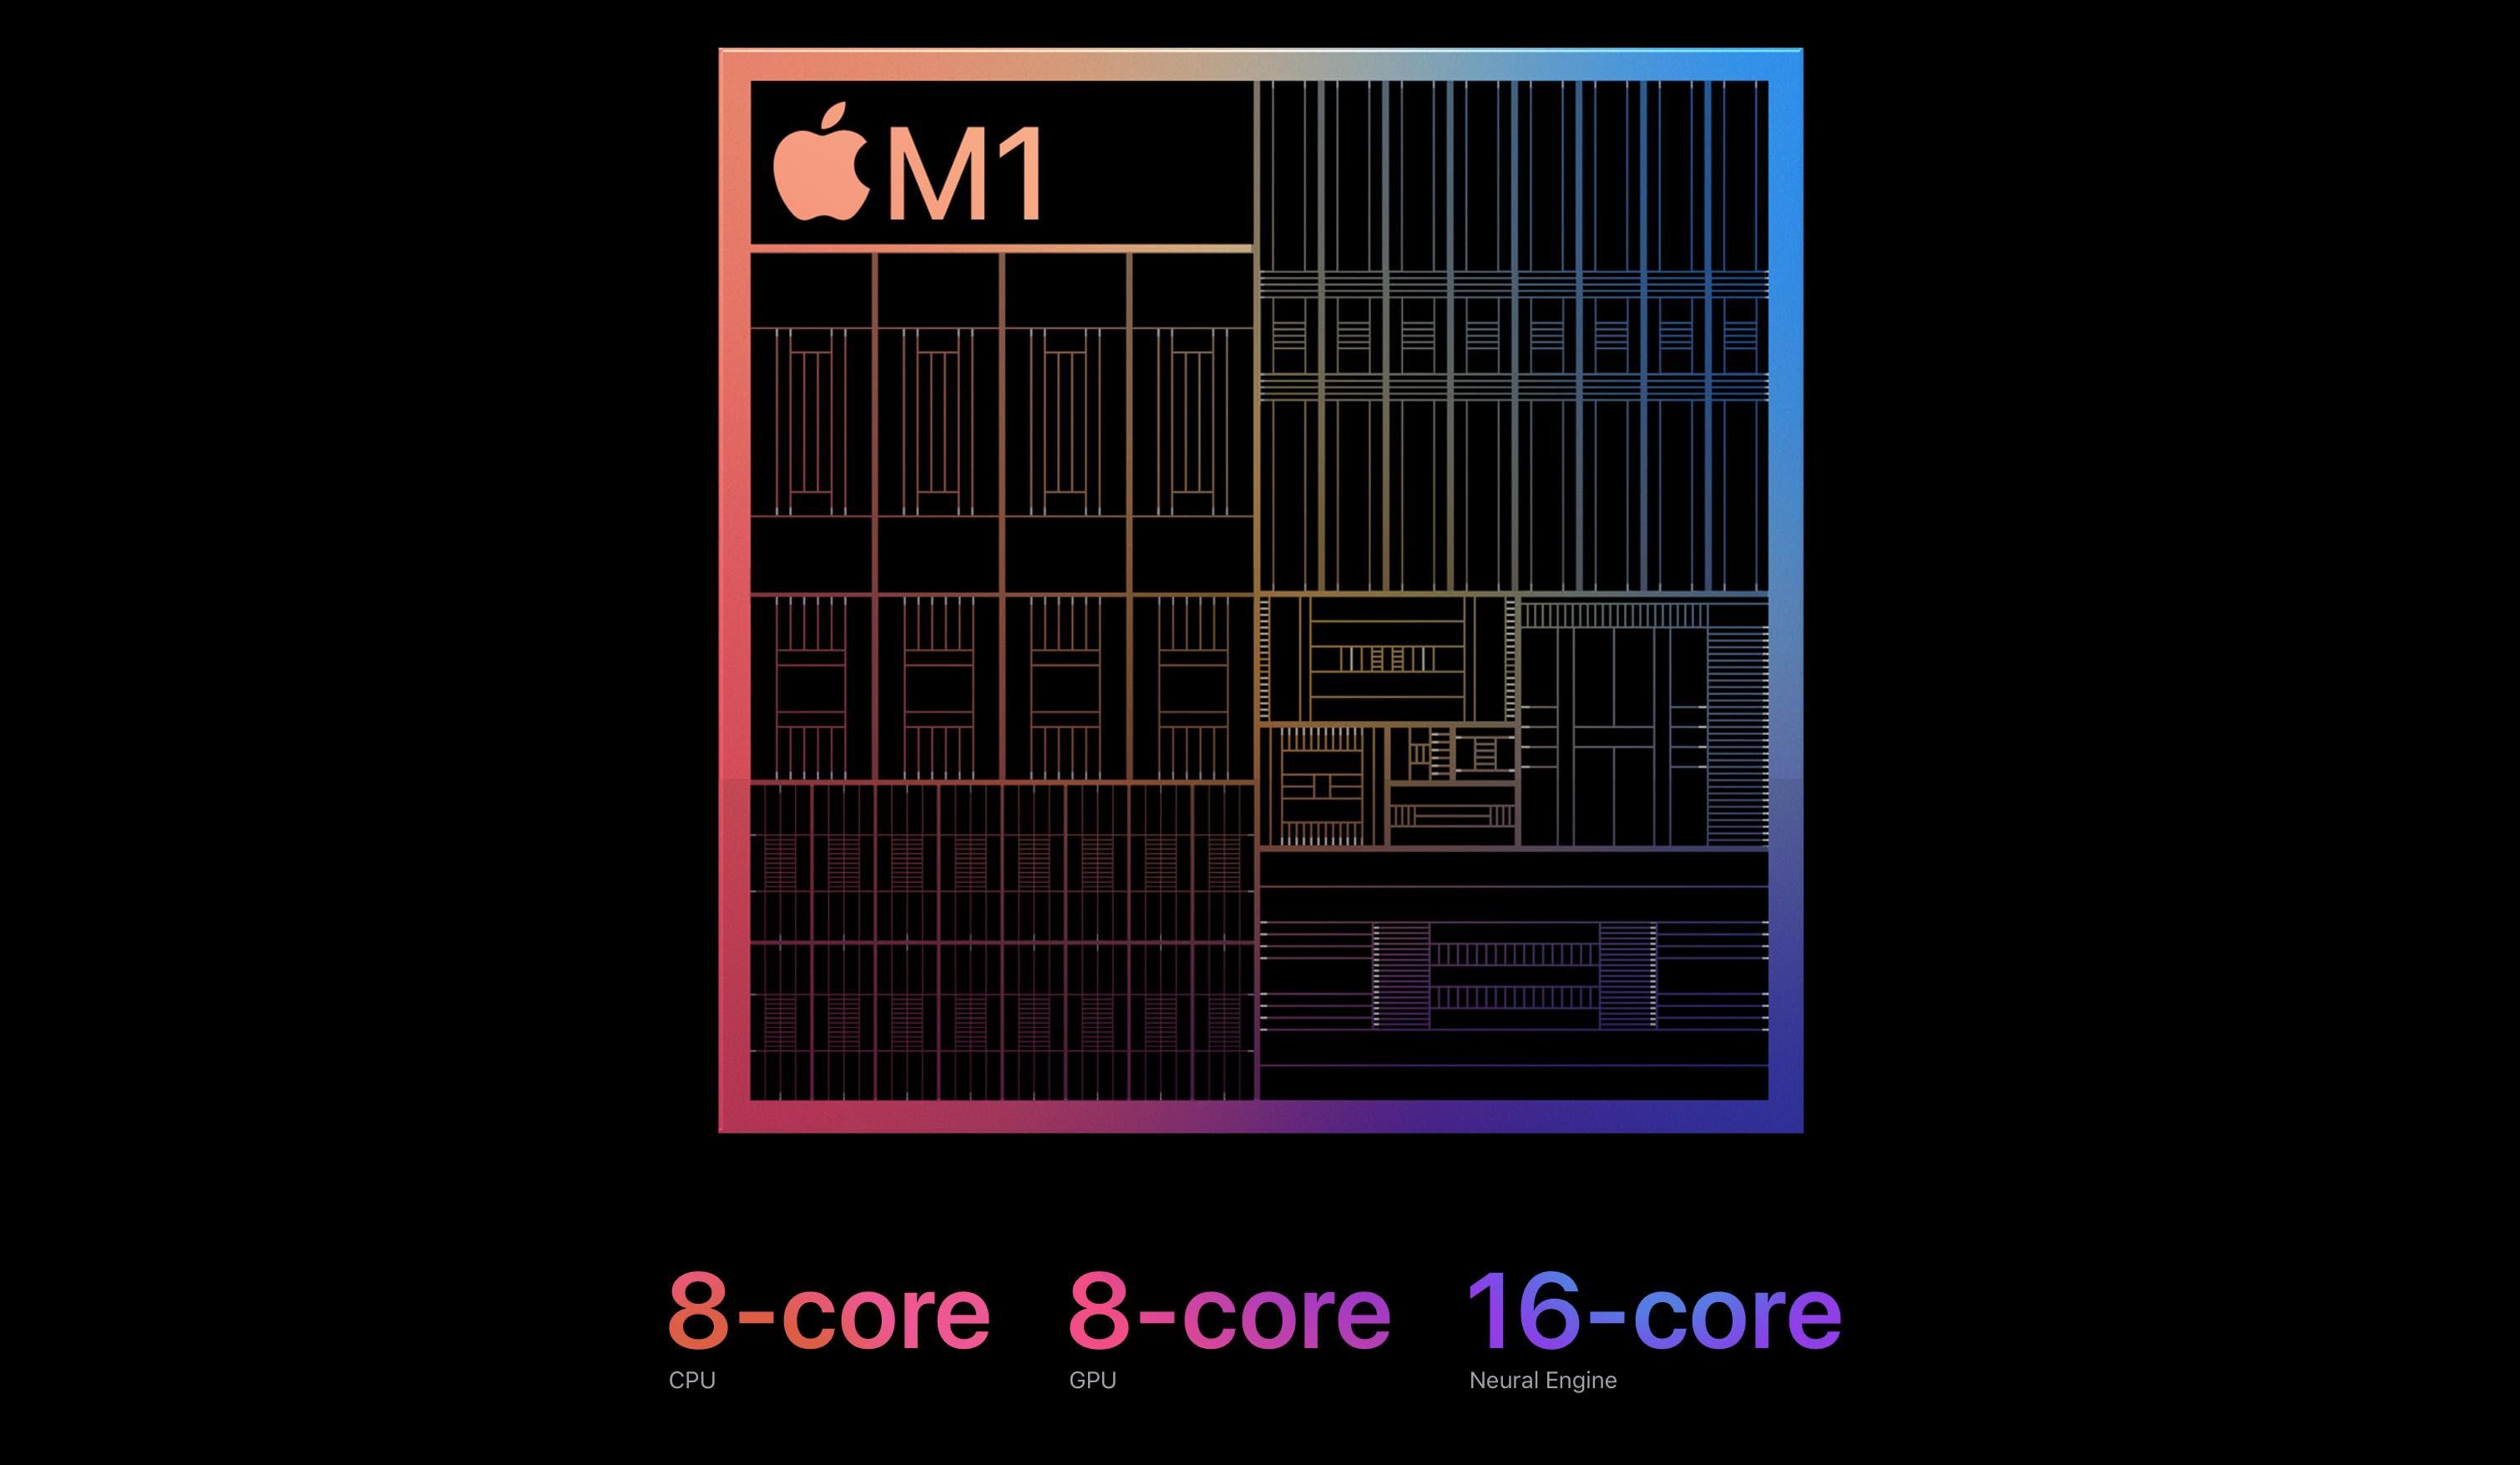 M1 iMac vs Intel iMac - CPU, GPU, more